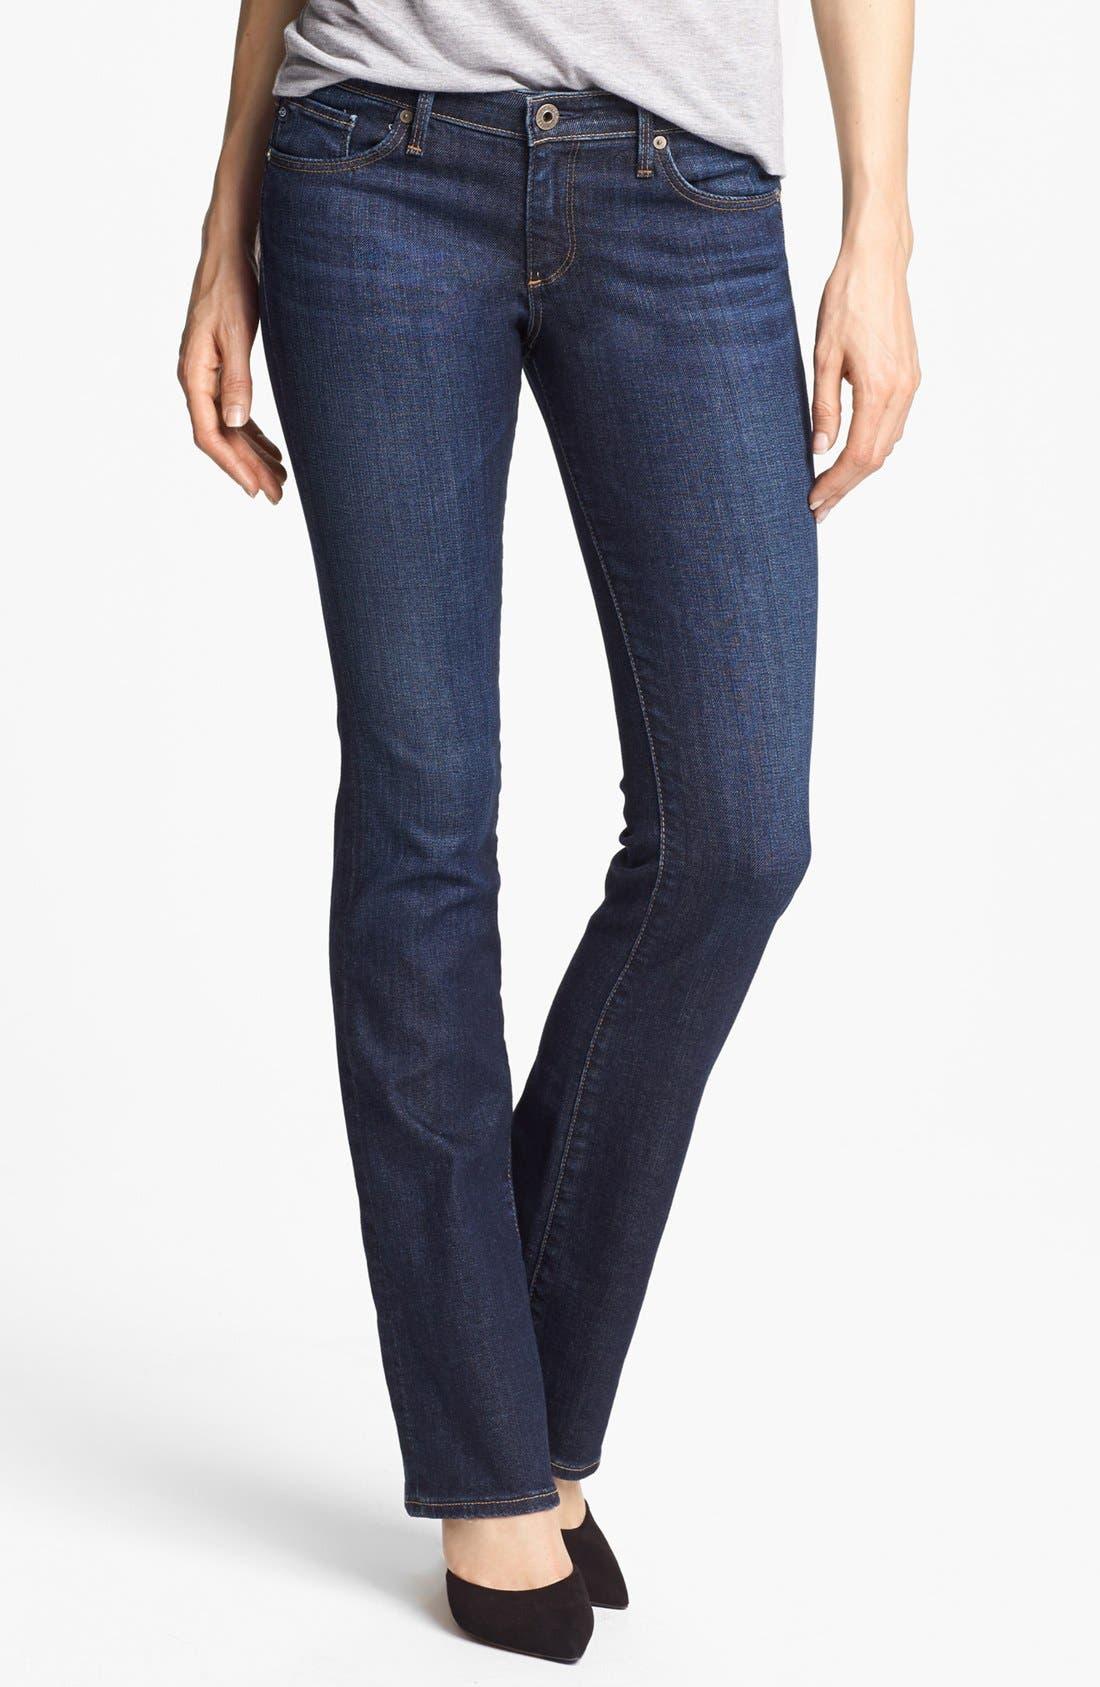 Ag olivia skinny bootcut jeans white